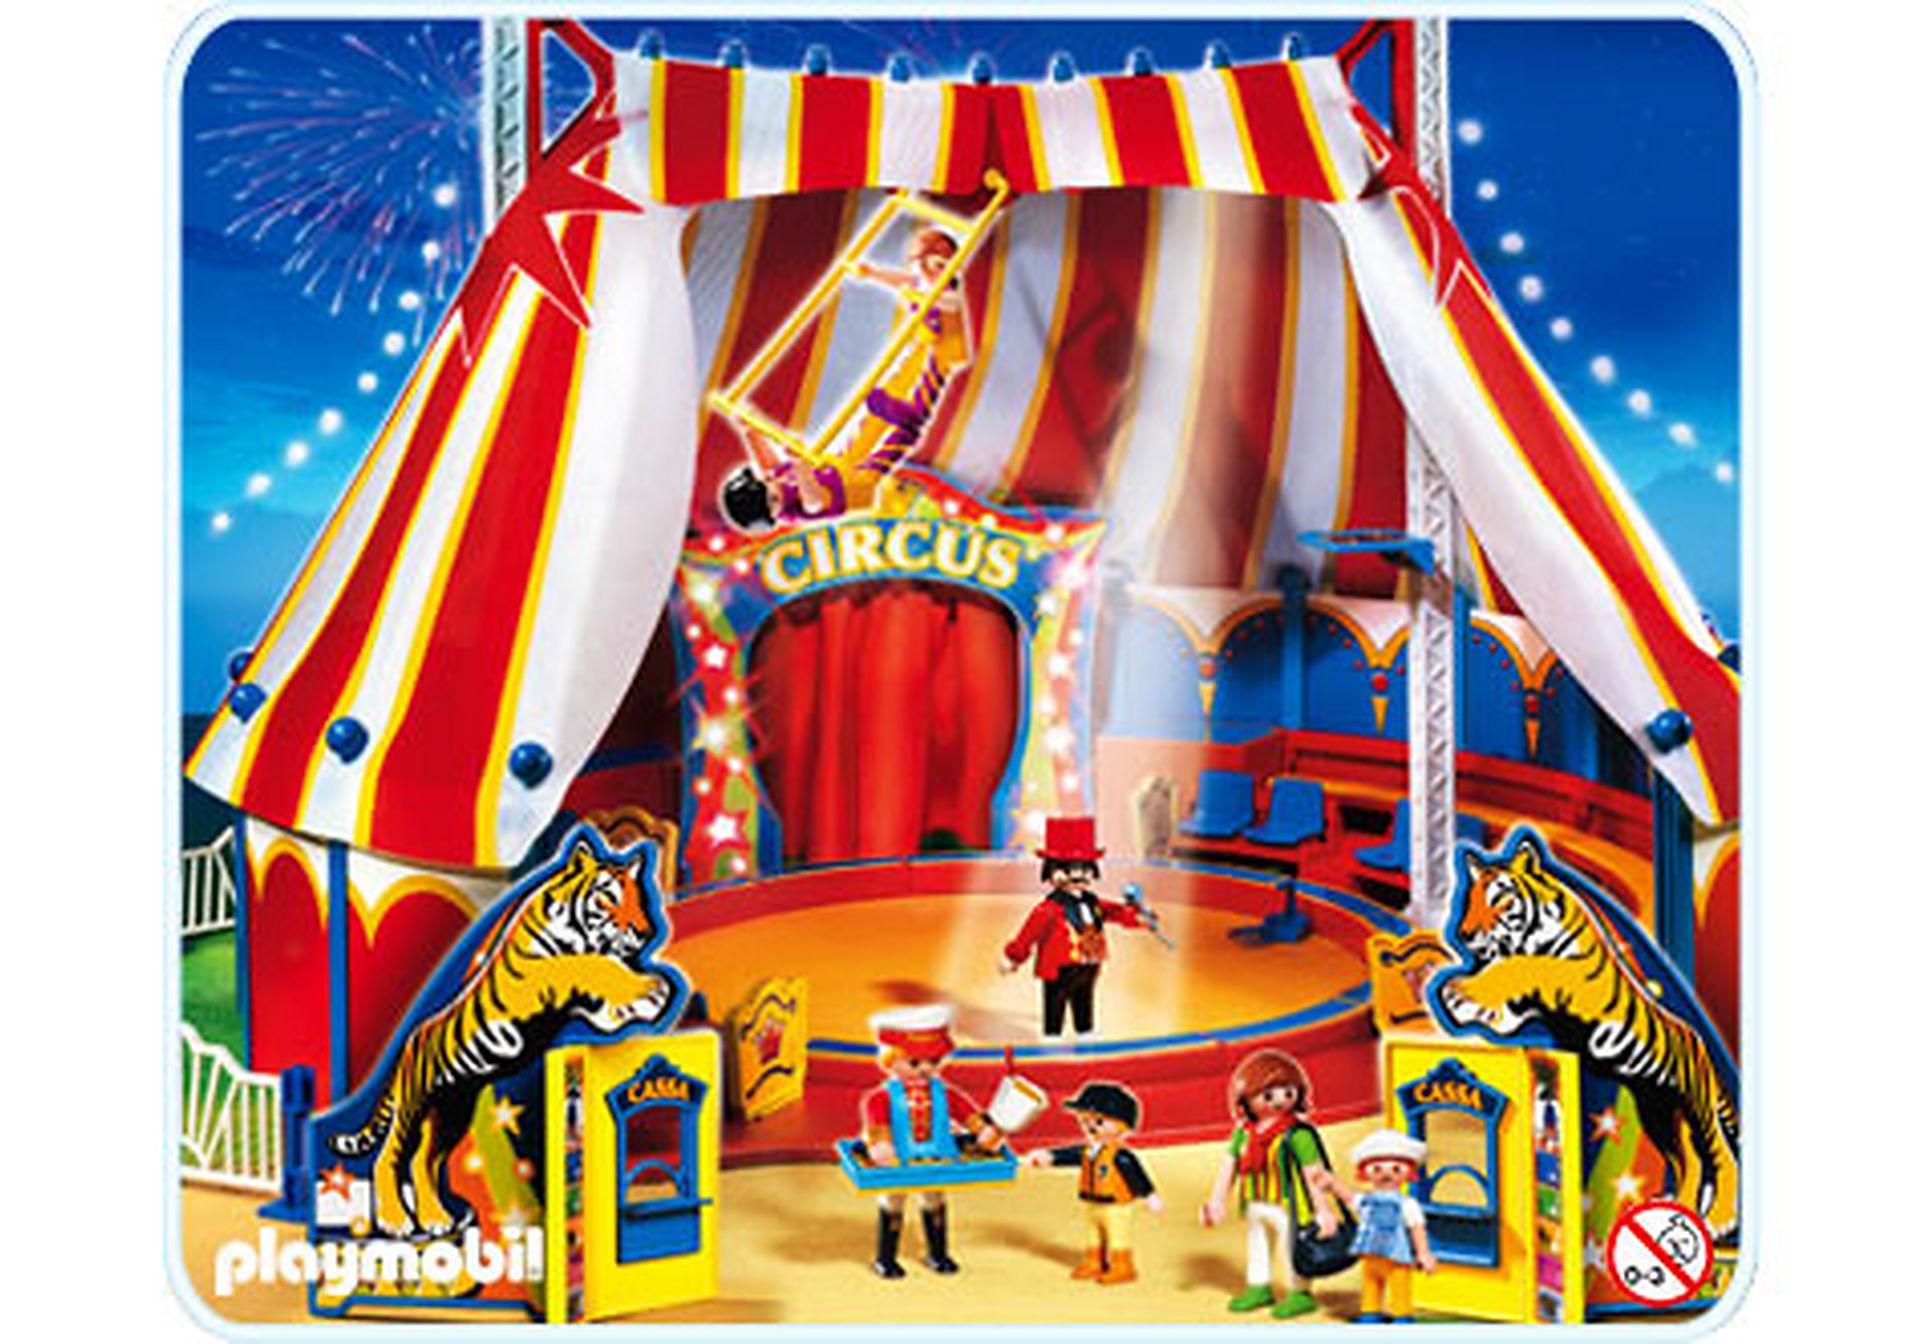 4230-A Grand chapiteau de cirque zoom image1